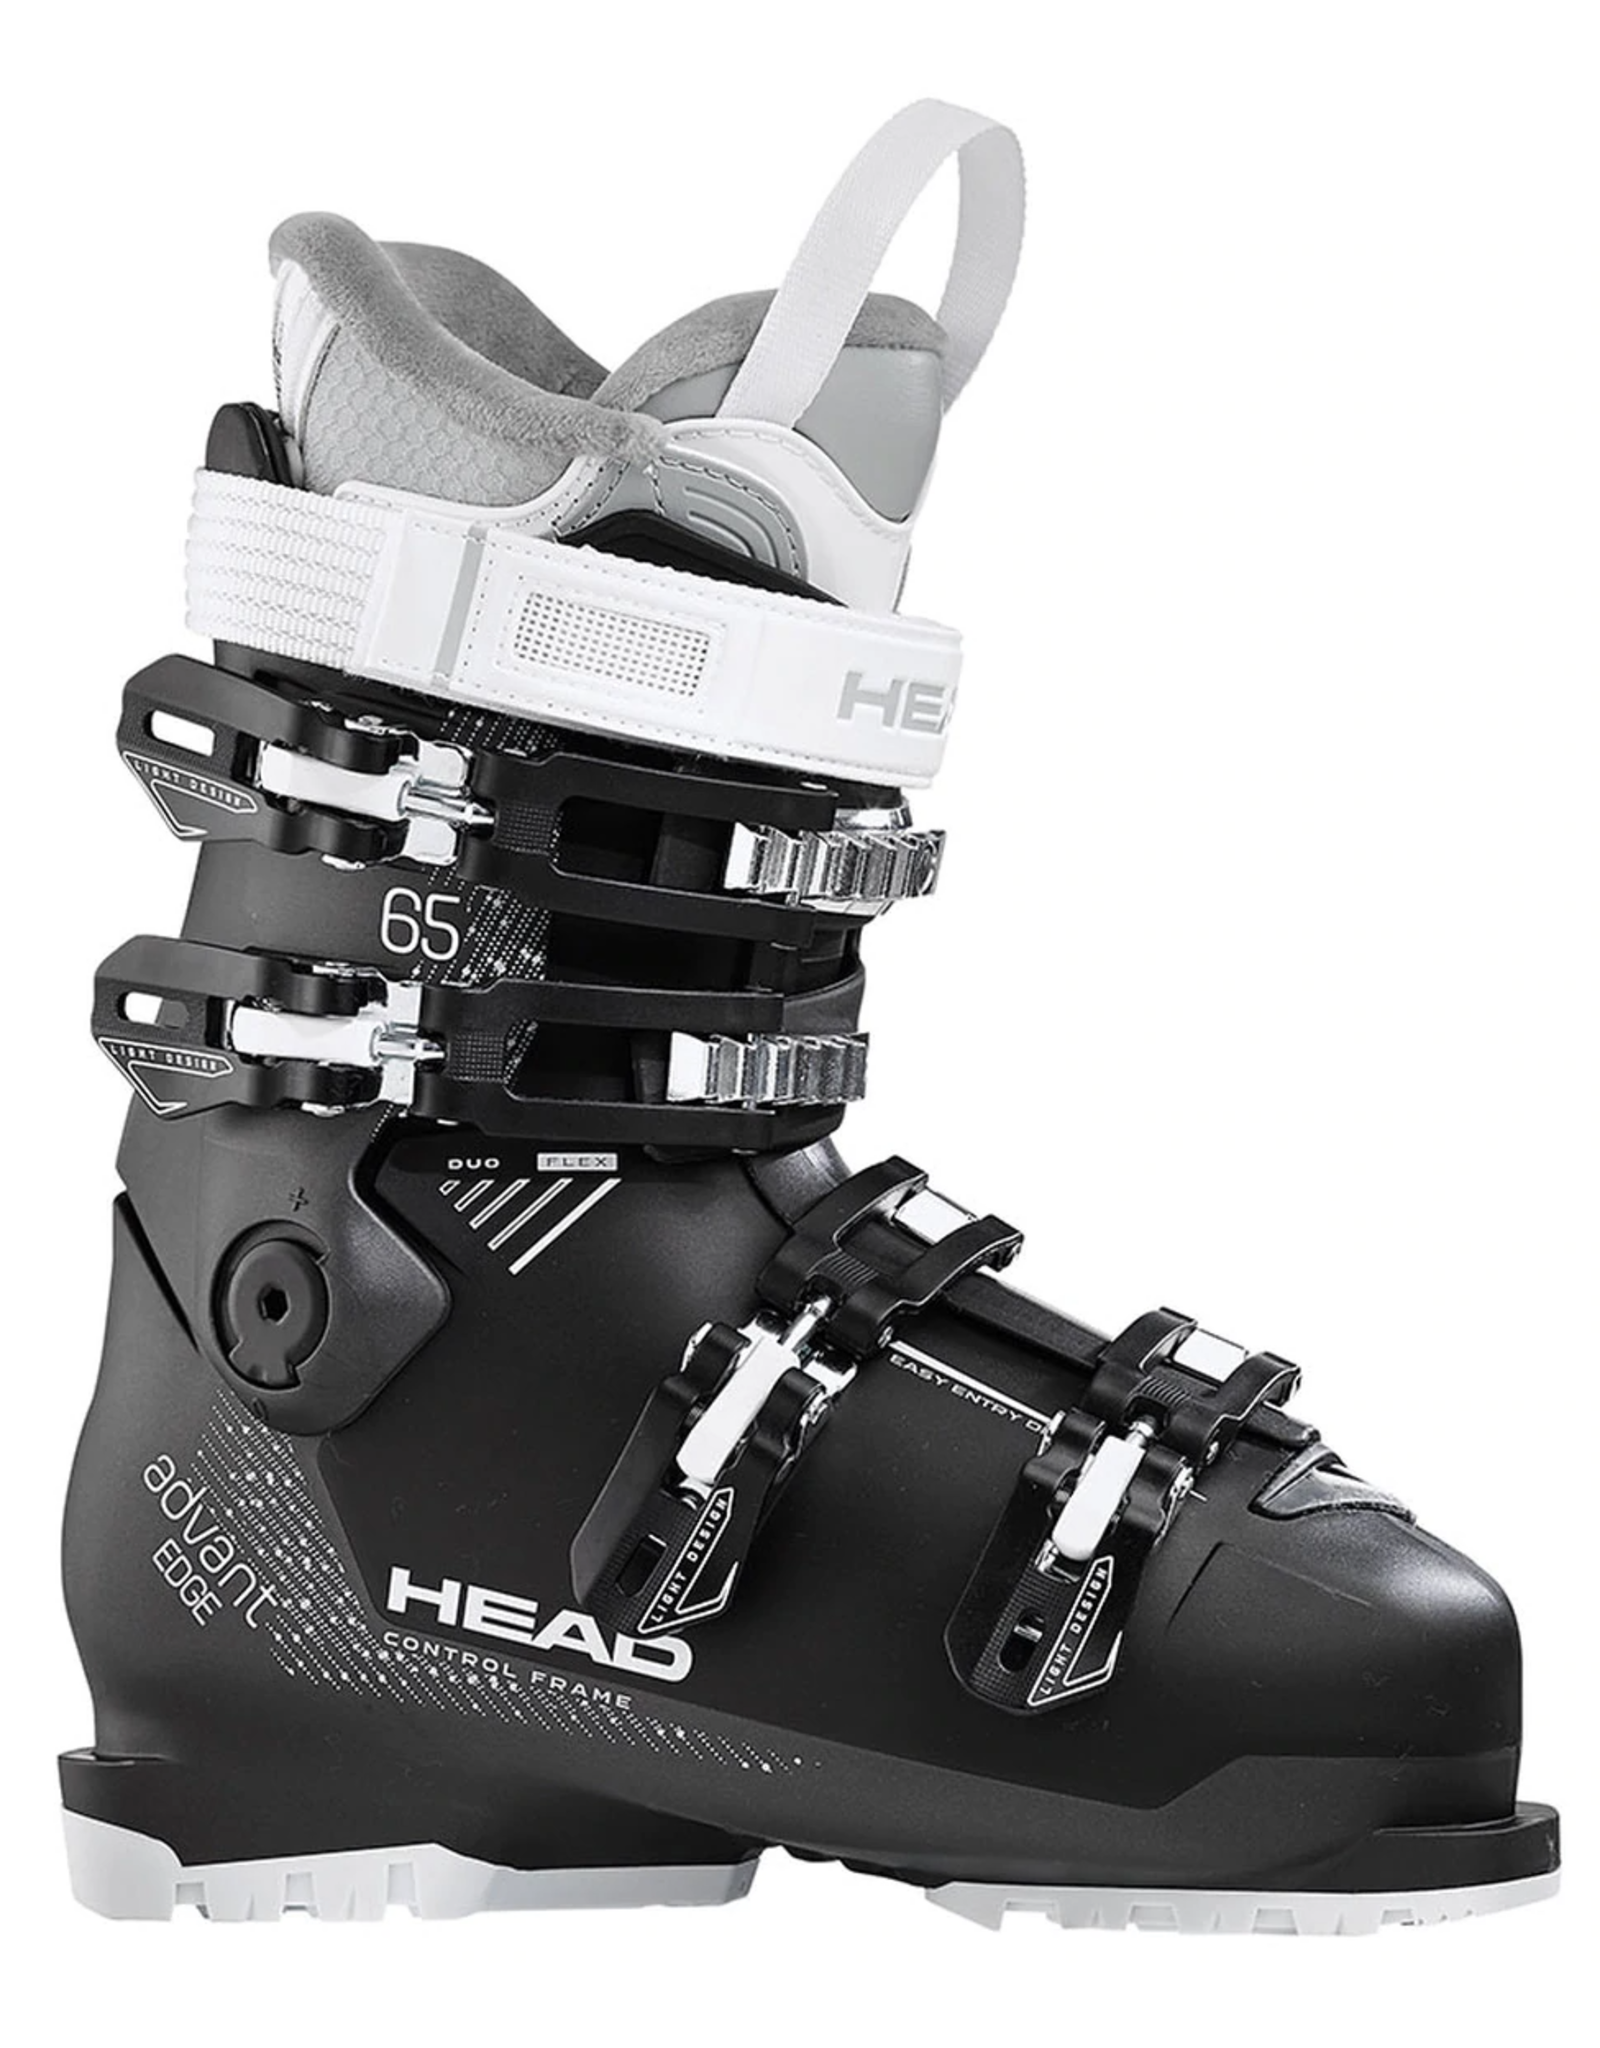 HEAD Head advant edge 65 w alpine ski boot black/anthracite 22